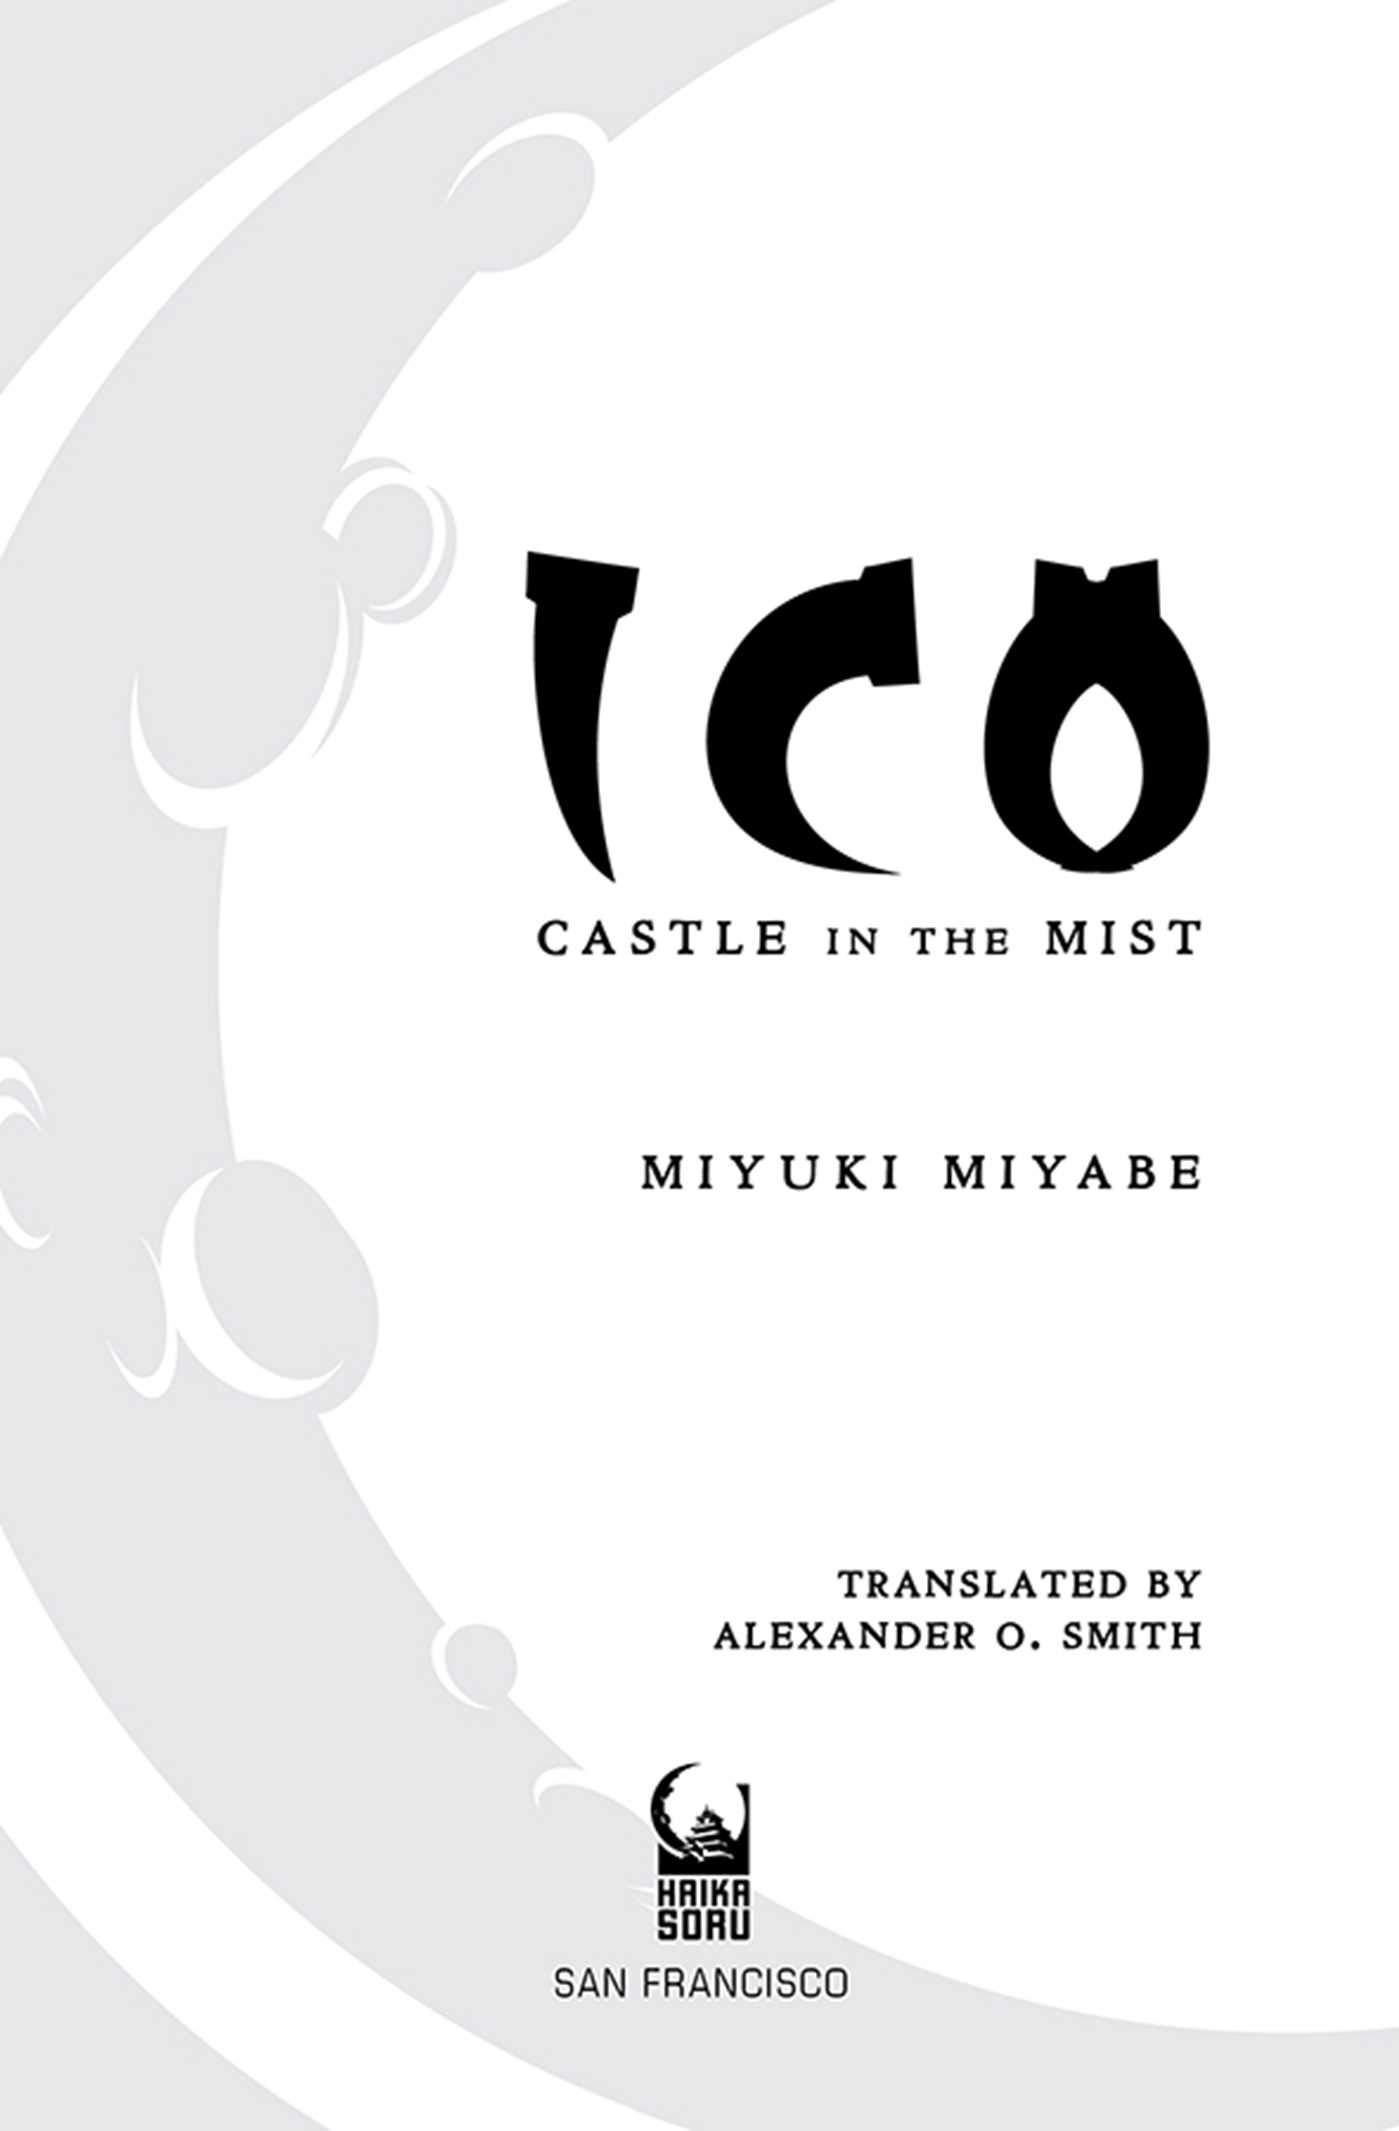 Amazon com: ICO: Castle in the Mist (9781421540634): Miyuki